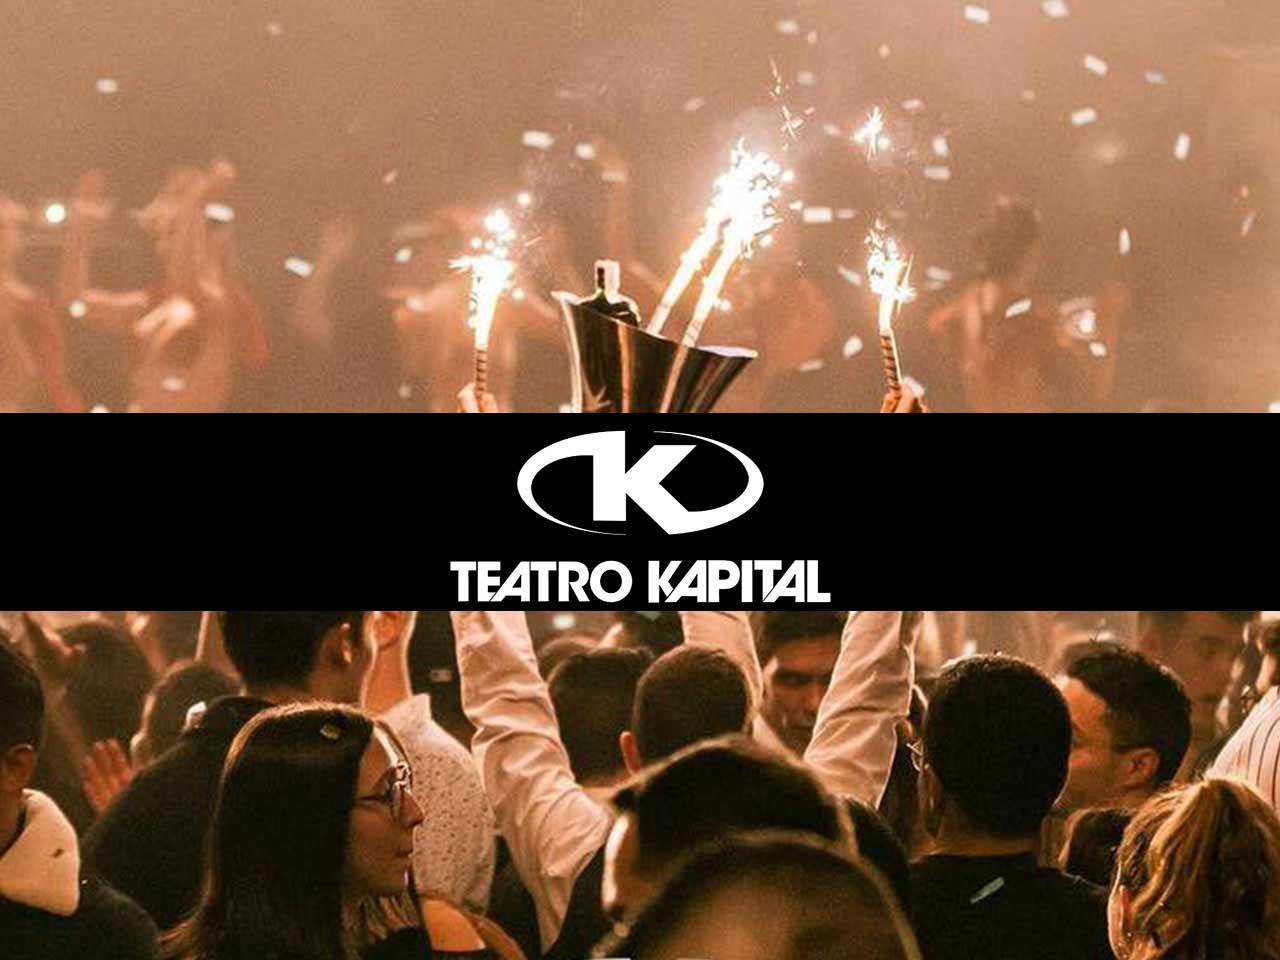 Kapital Madrid Club